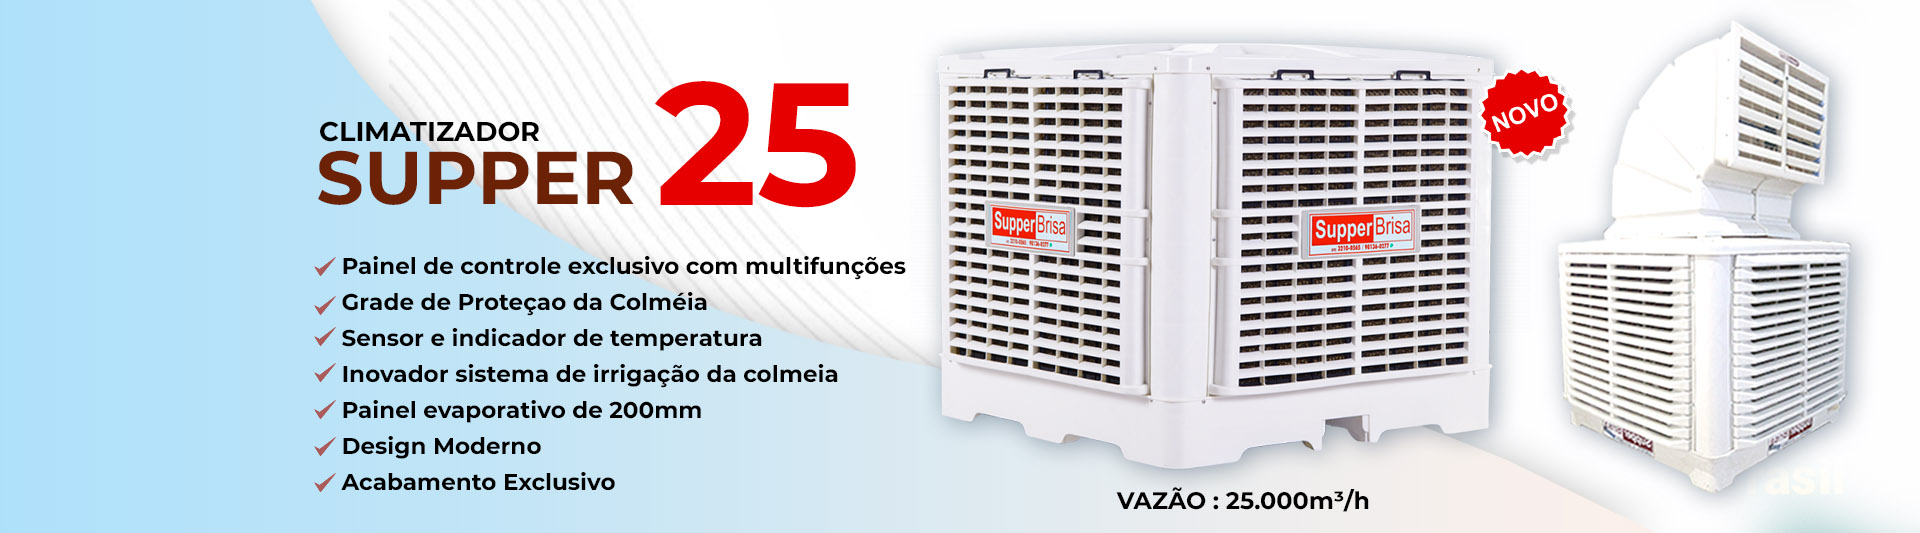 climatizador industrial evaporativo Supper Brisa Climatizadores Climatizacao banner agenciatem goiania